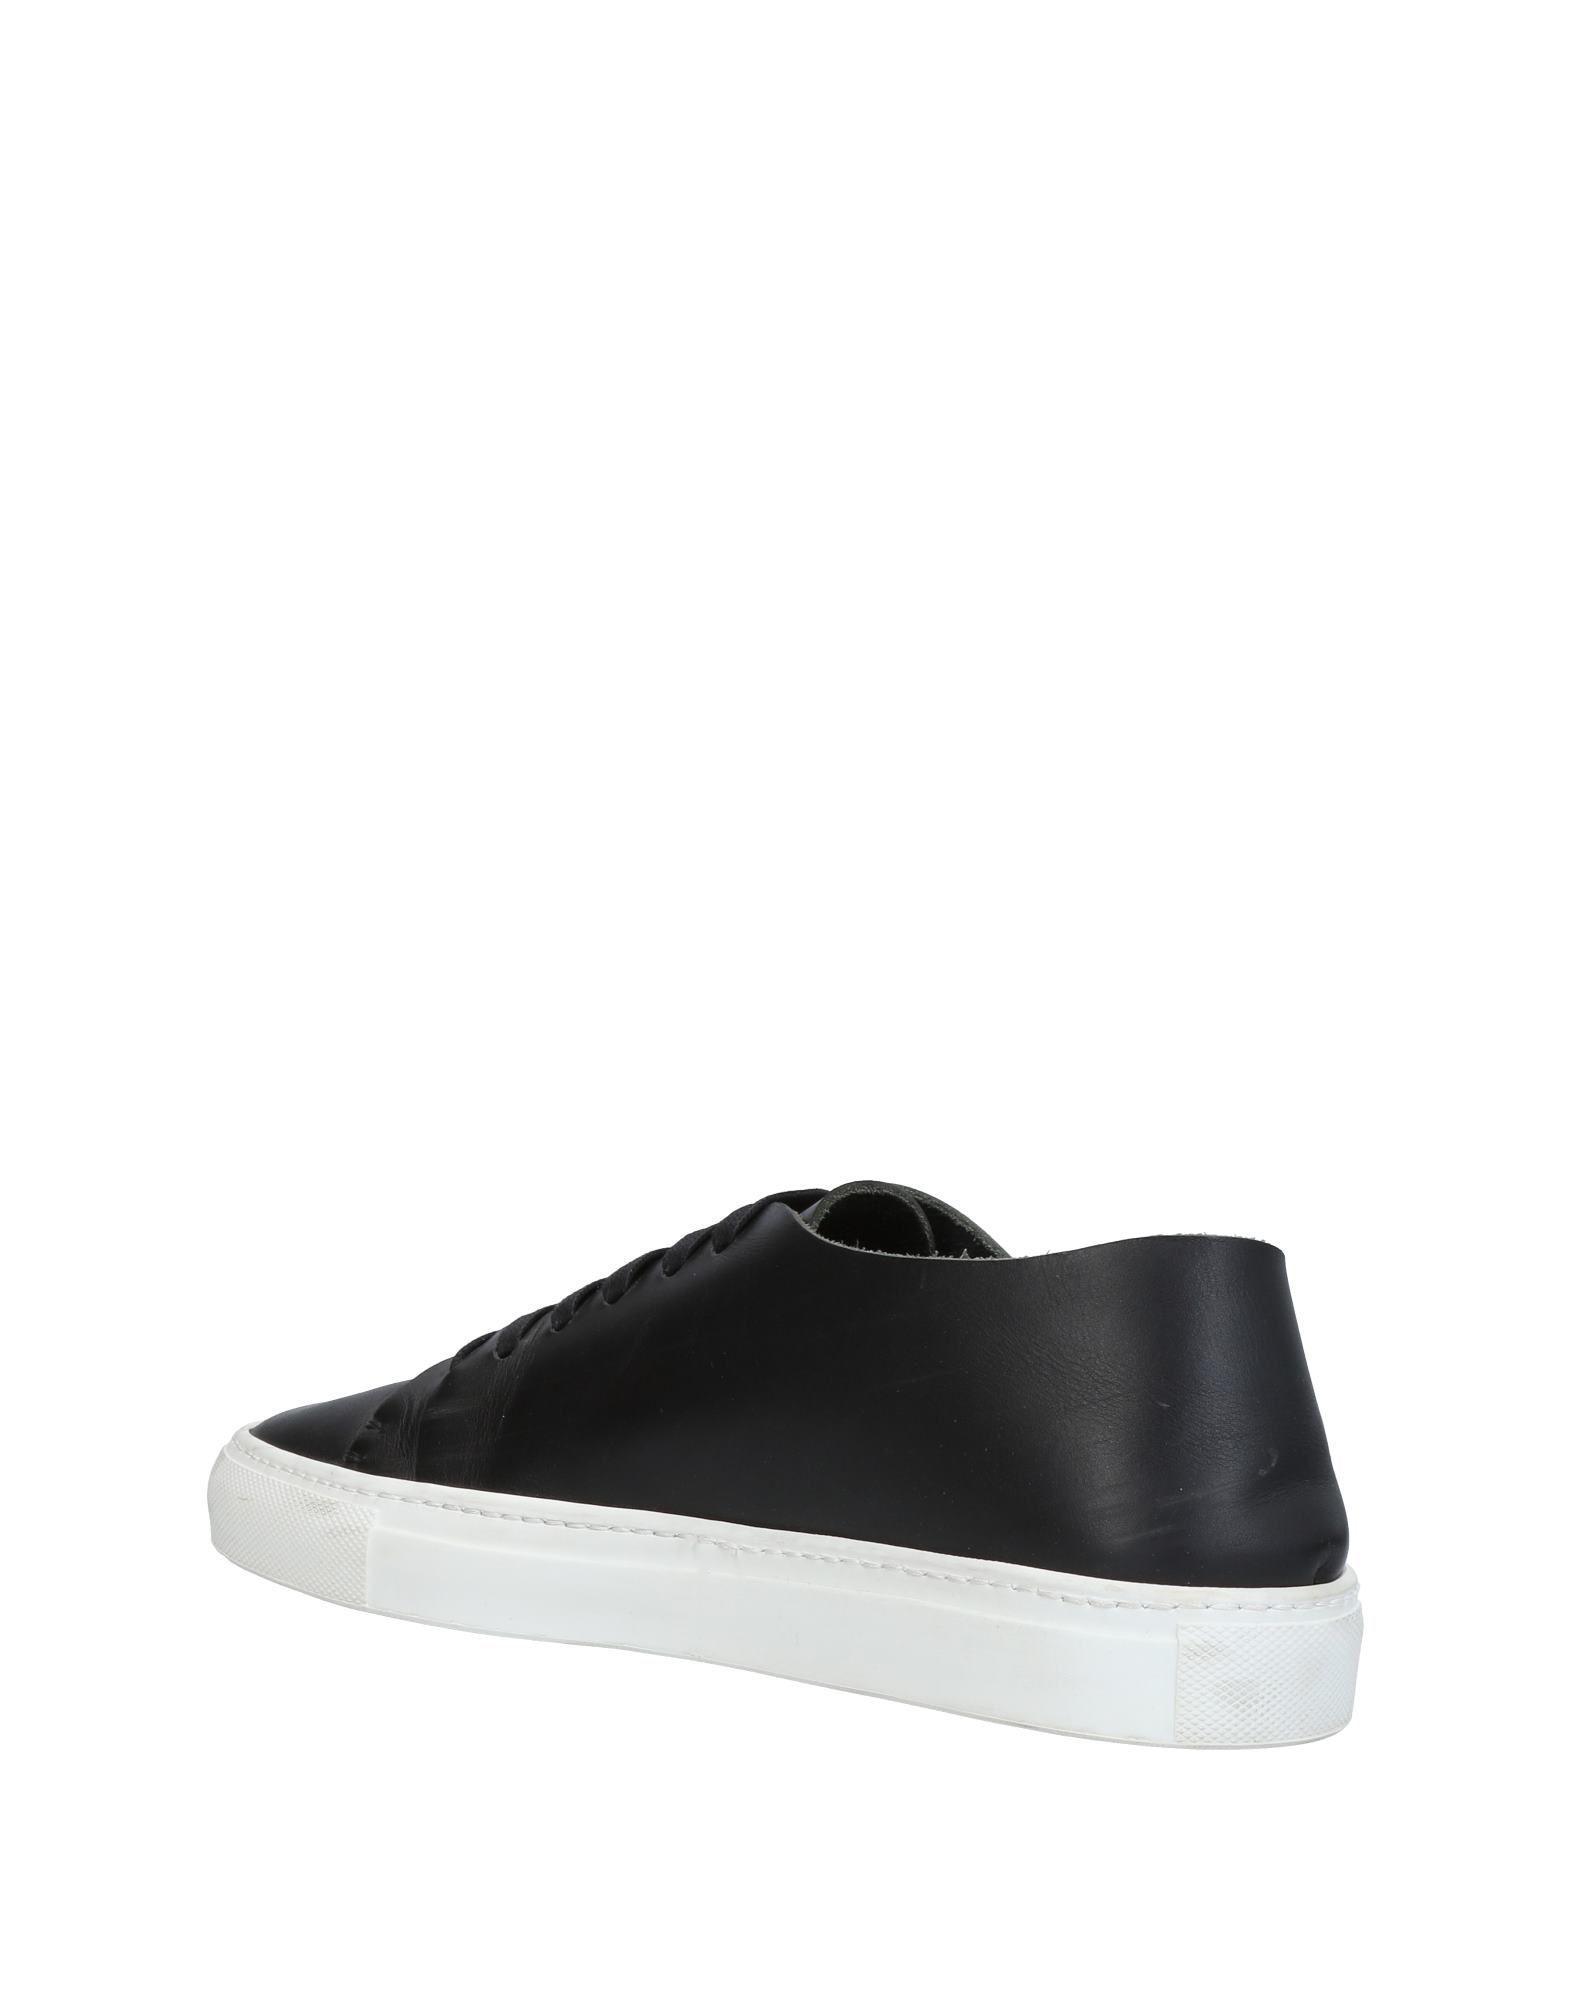 FOOTWEAR - Low-tops & sneakers Fabio Quaranta mJzVotGbHj